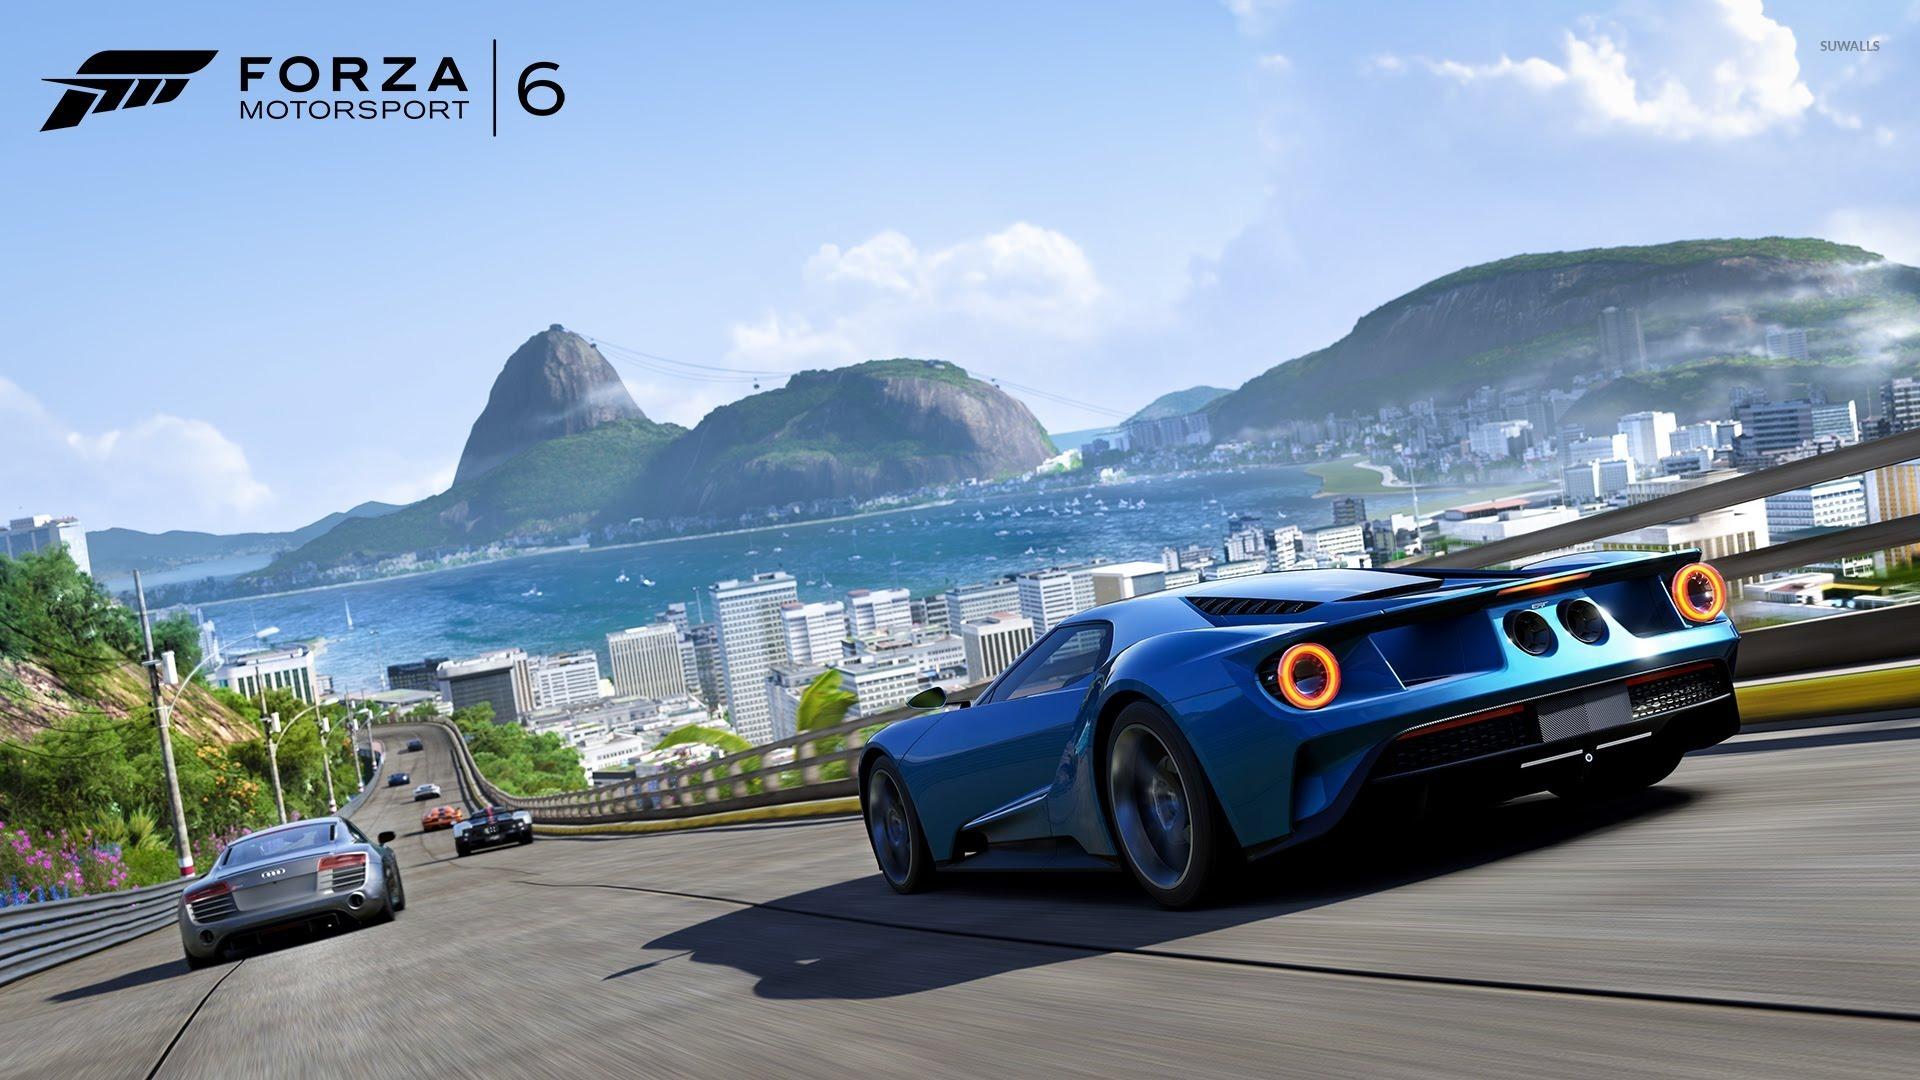 Forza Motorsport 6 wallpaper   Game wallpapers   44240 1920x1080